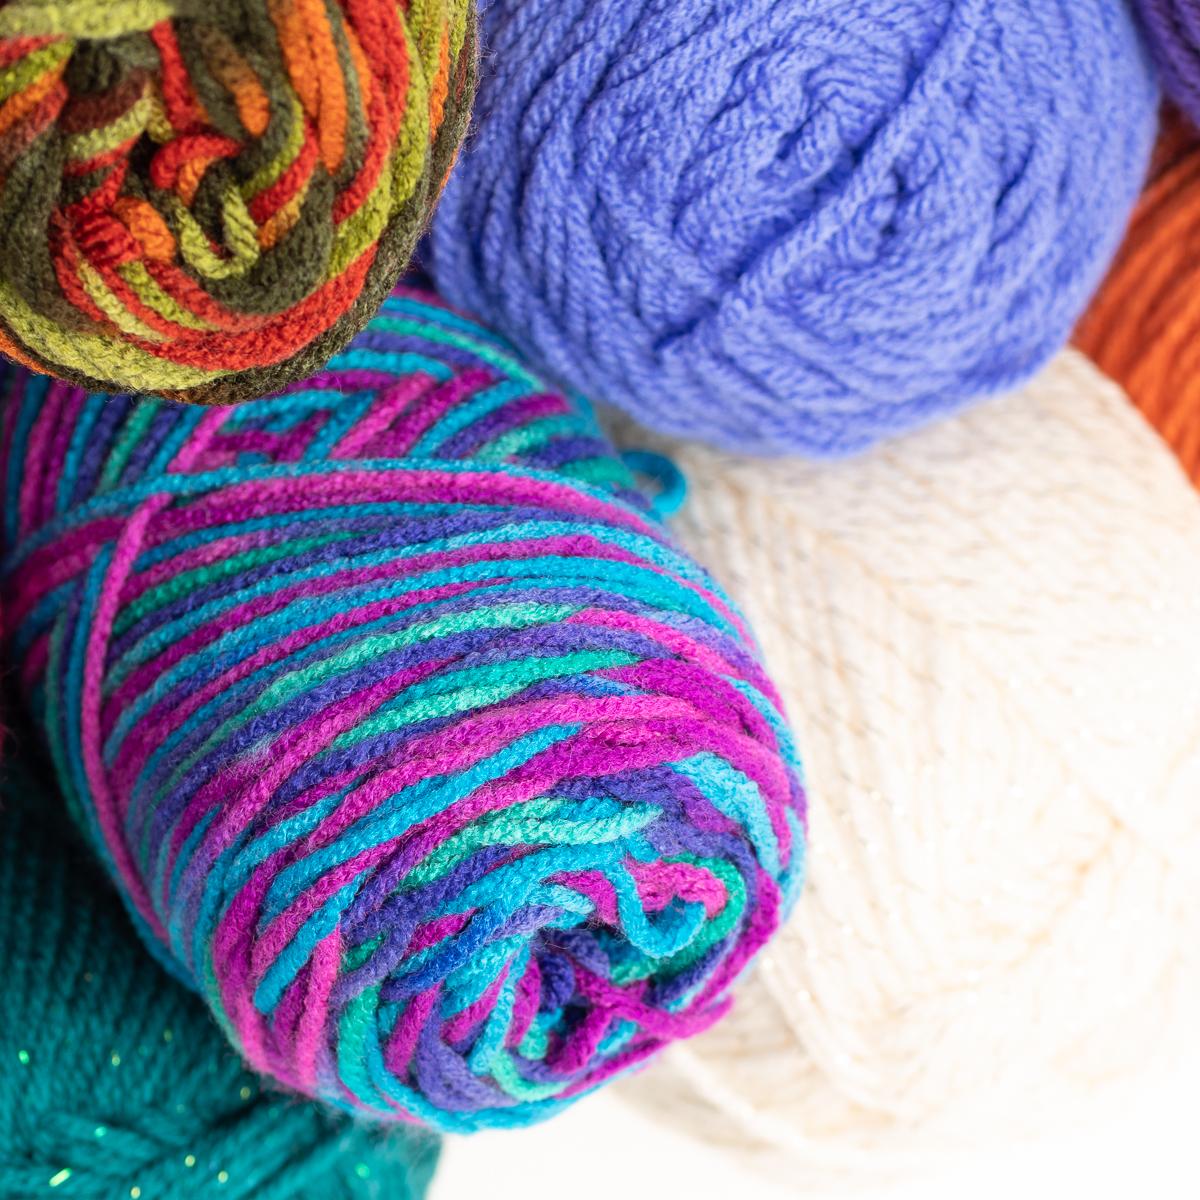 Red-Heart-With-Love-100-Acrylic-Yarn-Knitting-Crochet-Medium-4-Skein-Soft thumbnail 19